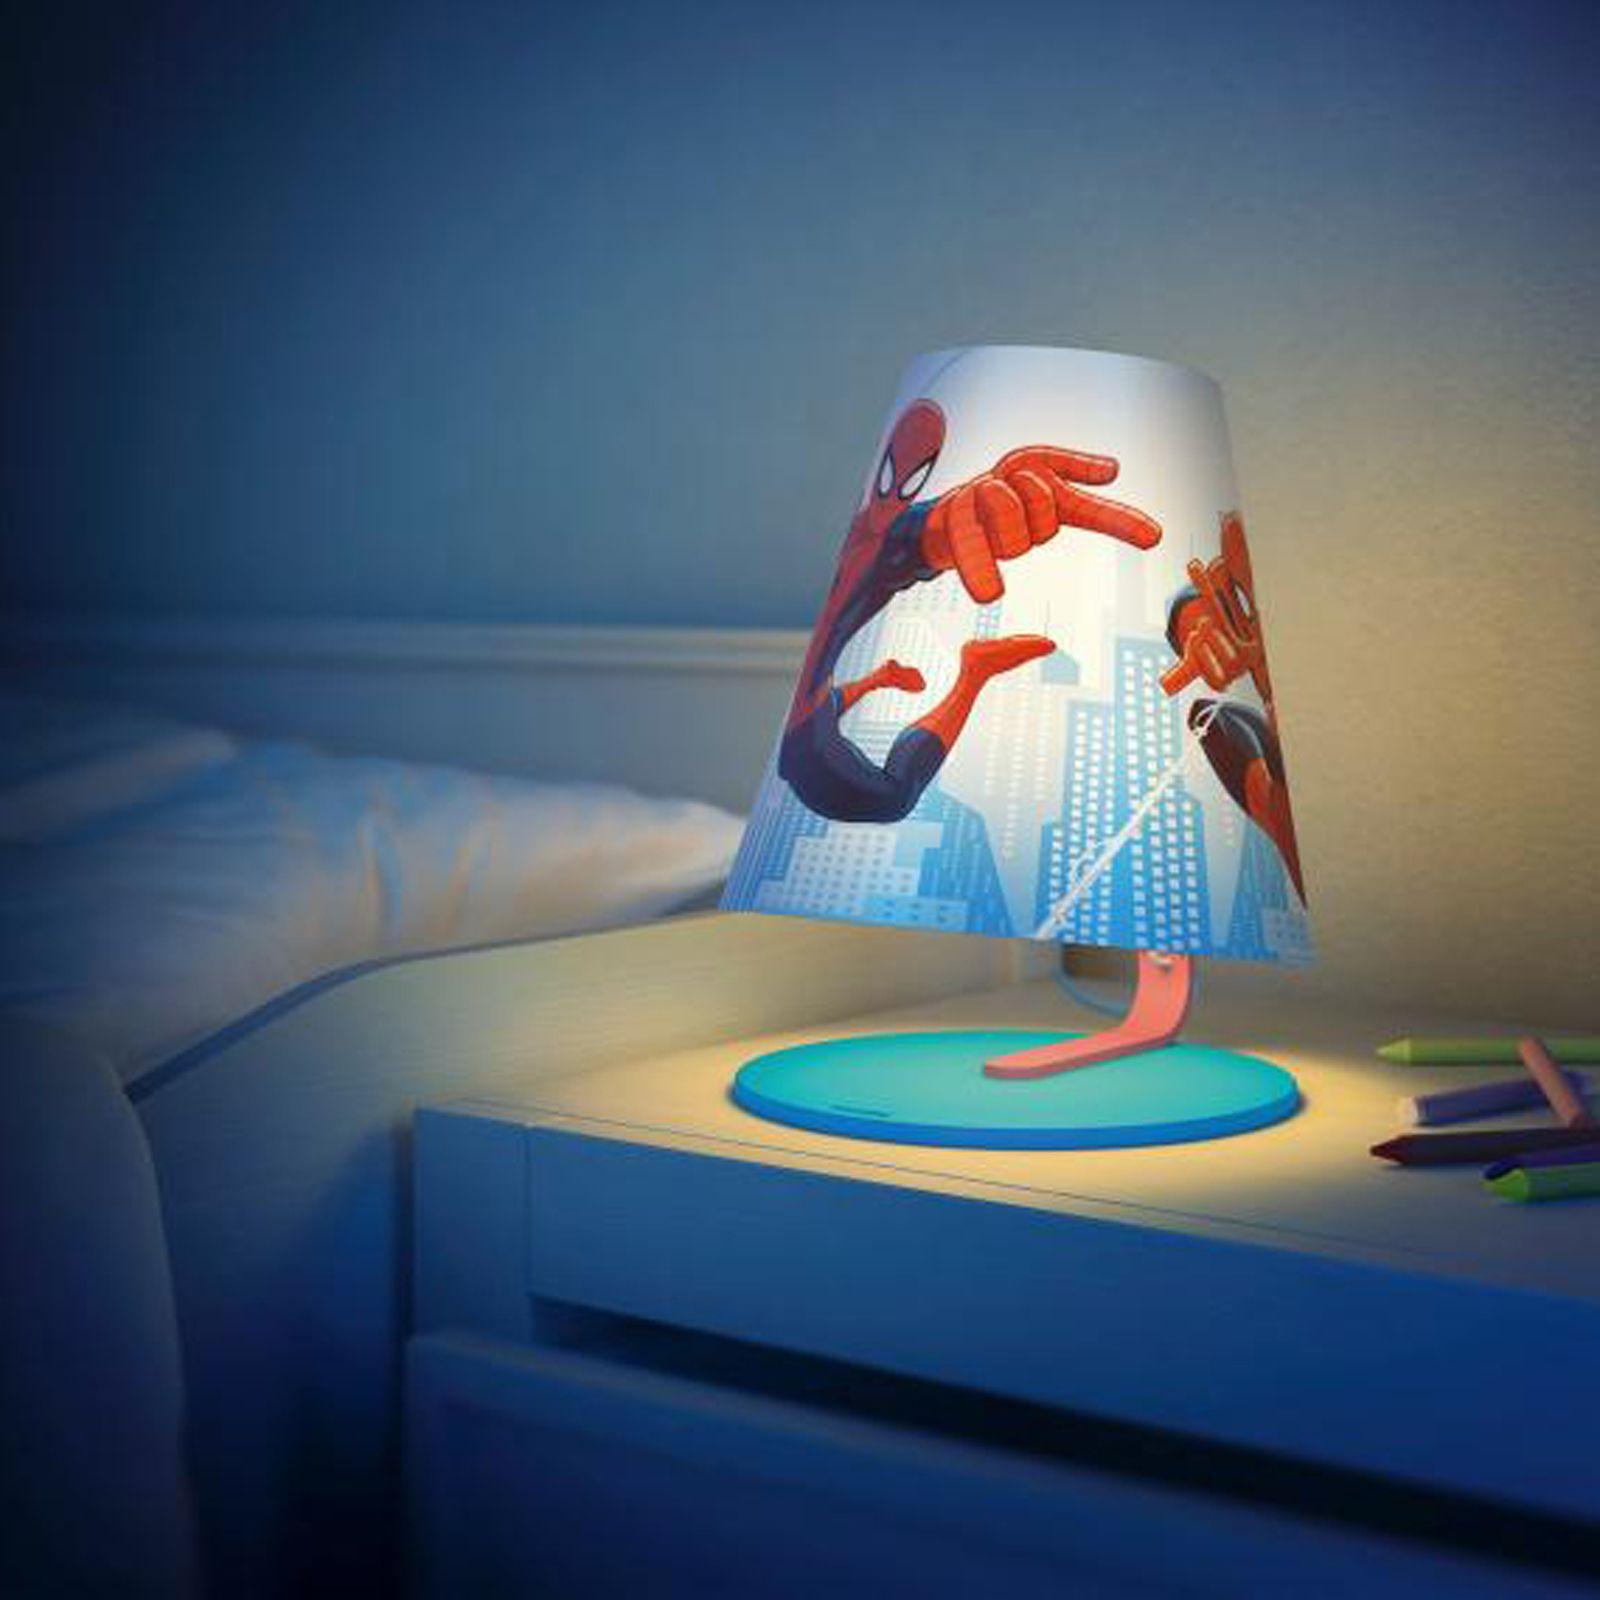 philips enfants chevet lit lampes design divers clairage chambre ebay. Black Bedroom Furniture Sets. Home Design Ideas